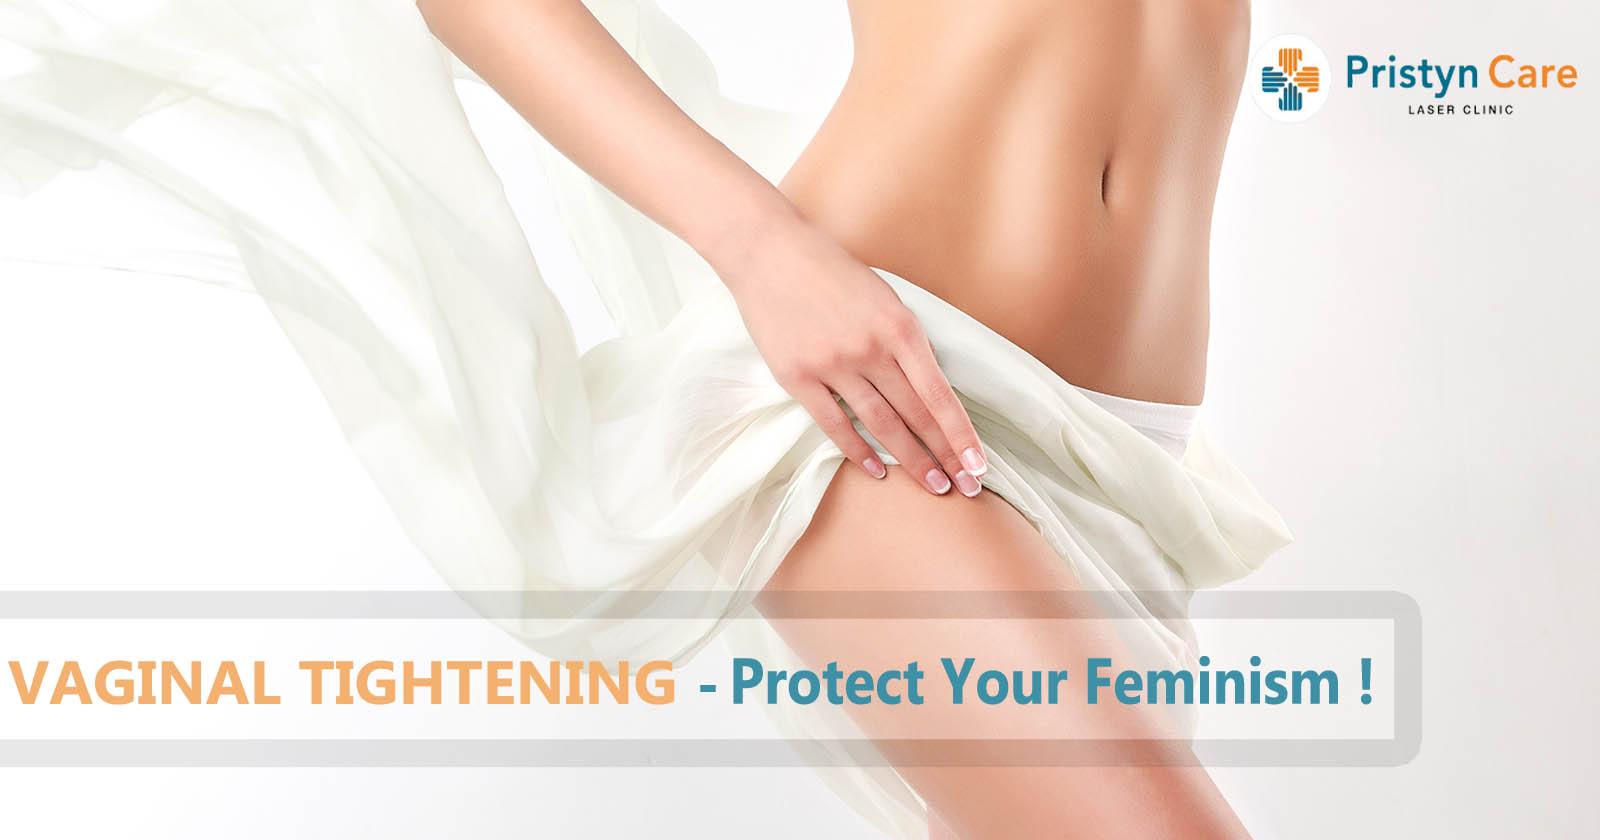 vaginal tightening for feminism